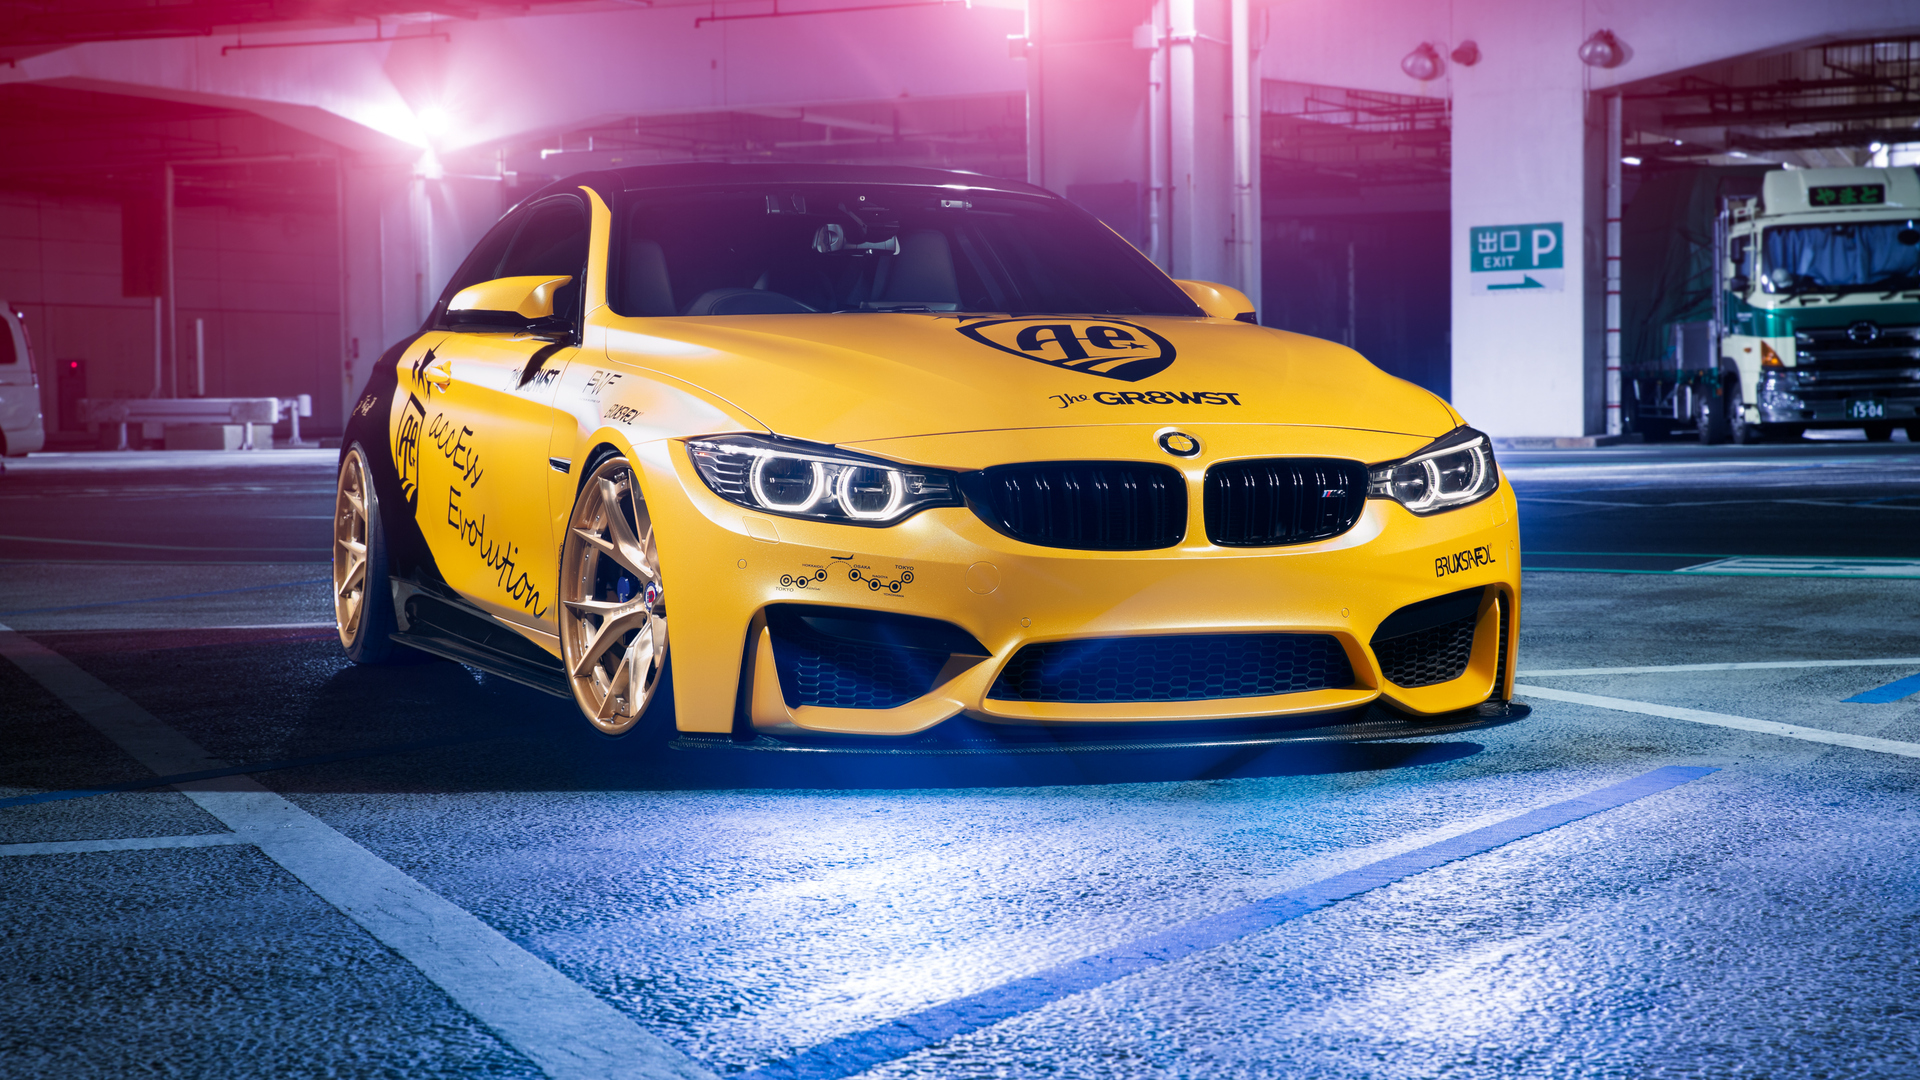 1920x1080 BMW M4 Automotive Design Laptop Full HD 1080P HD ...